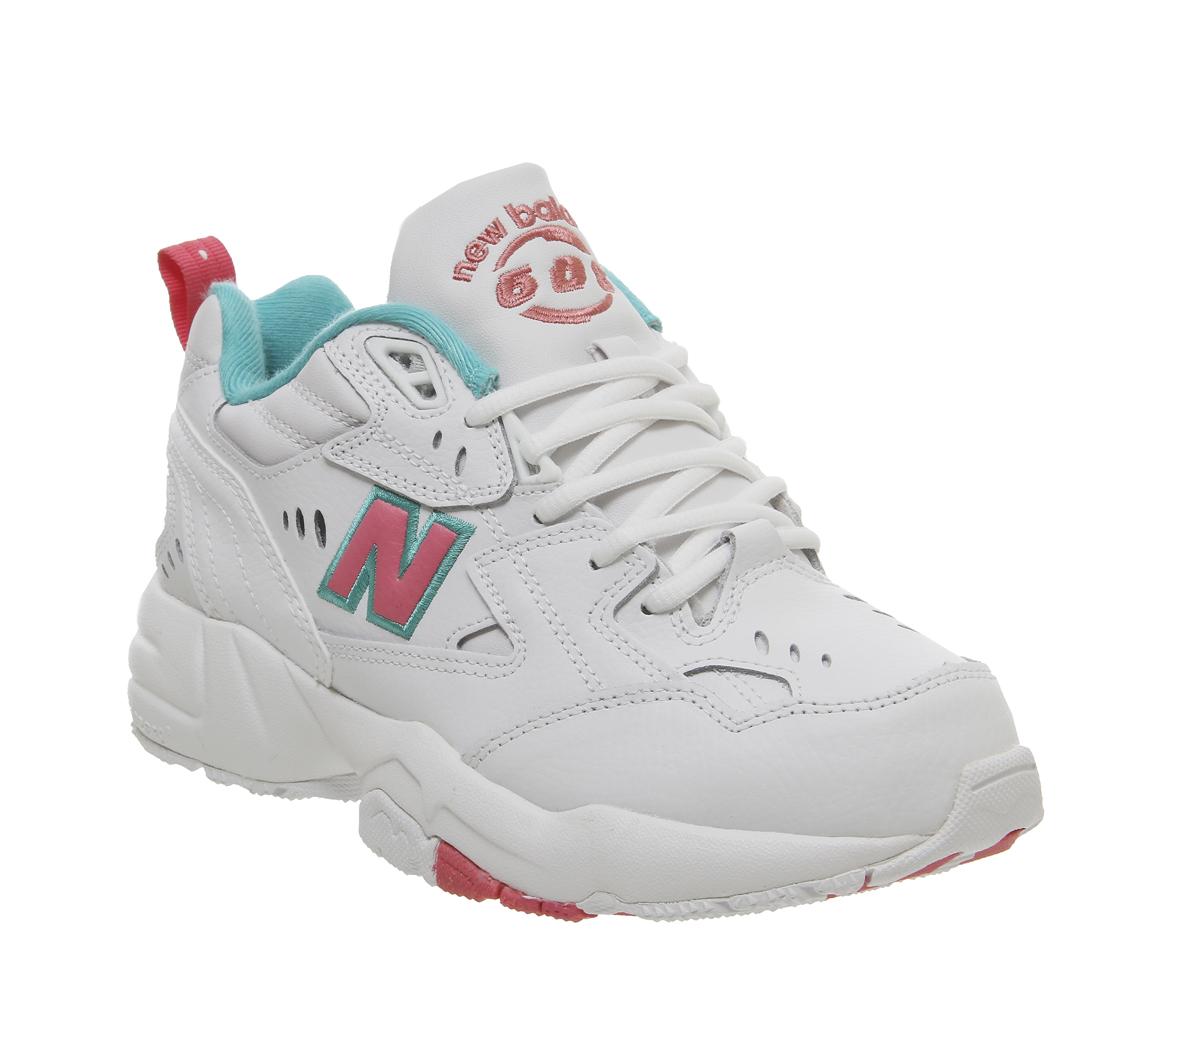 scarpe ginnastica donna new balance verdi ce